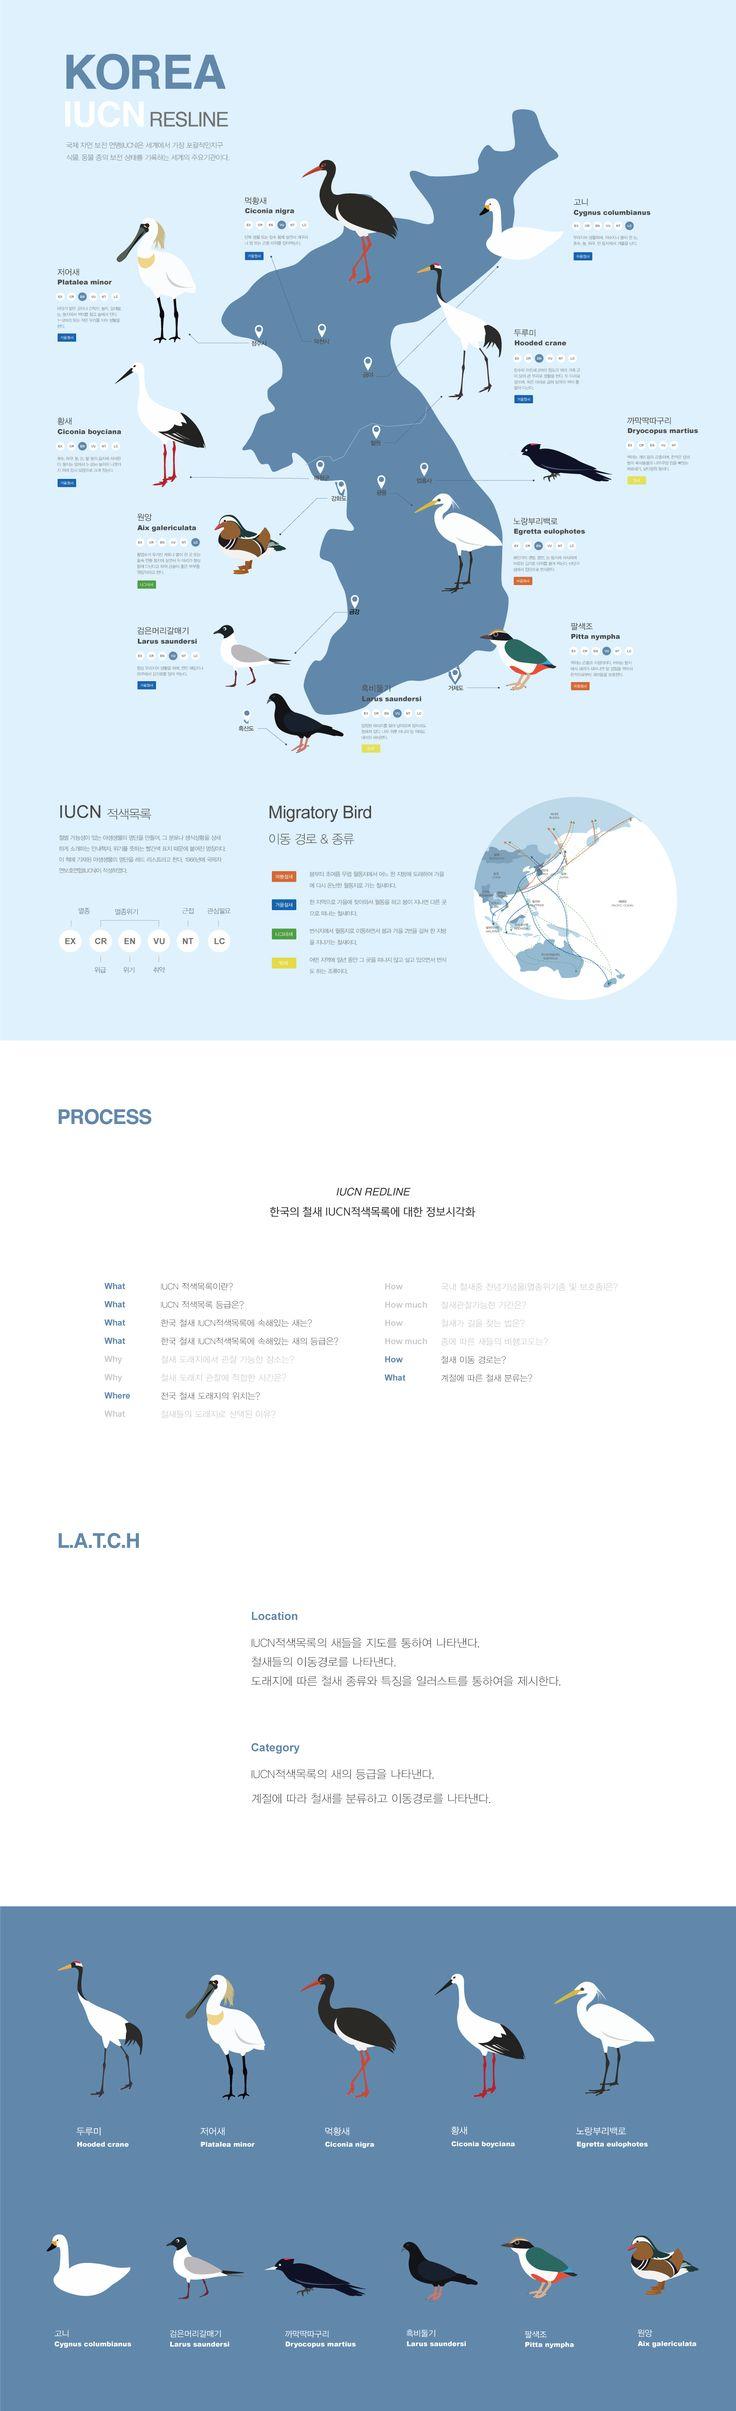 Cho YeJi │ Information Design 2015│ Major in Digital Media Design │#hicoda │hicoda.hongik.ac.kr